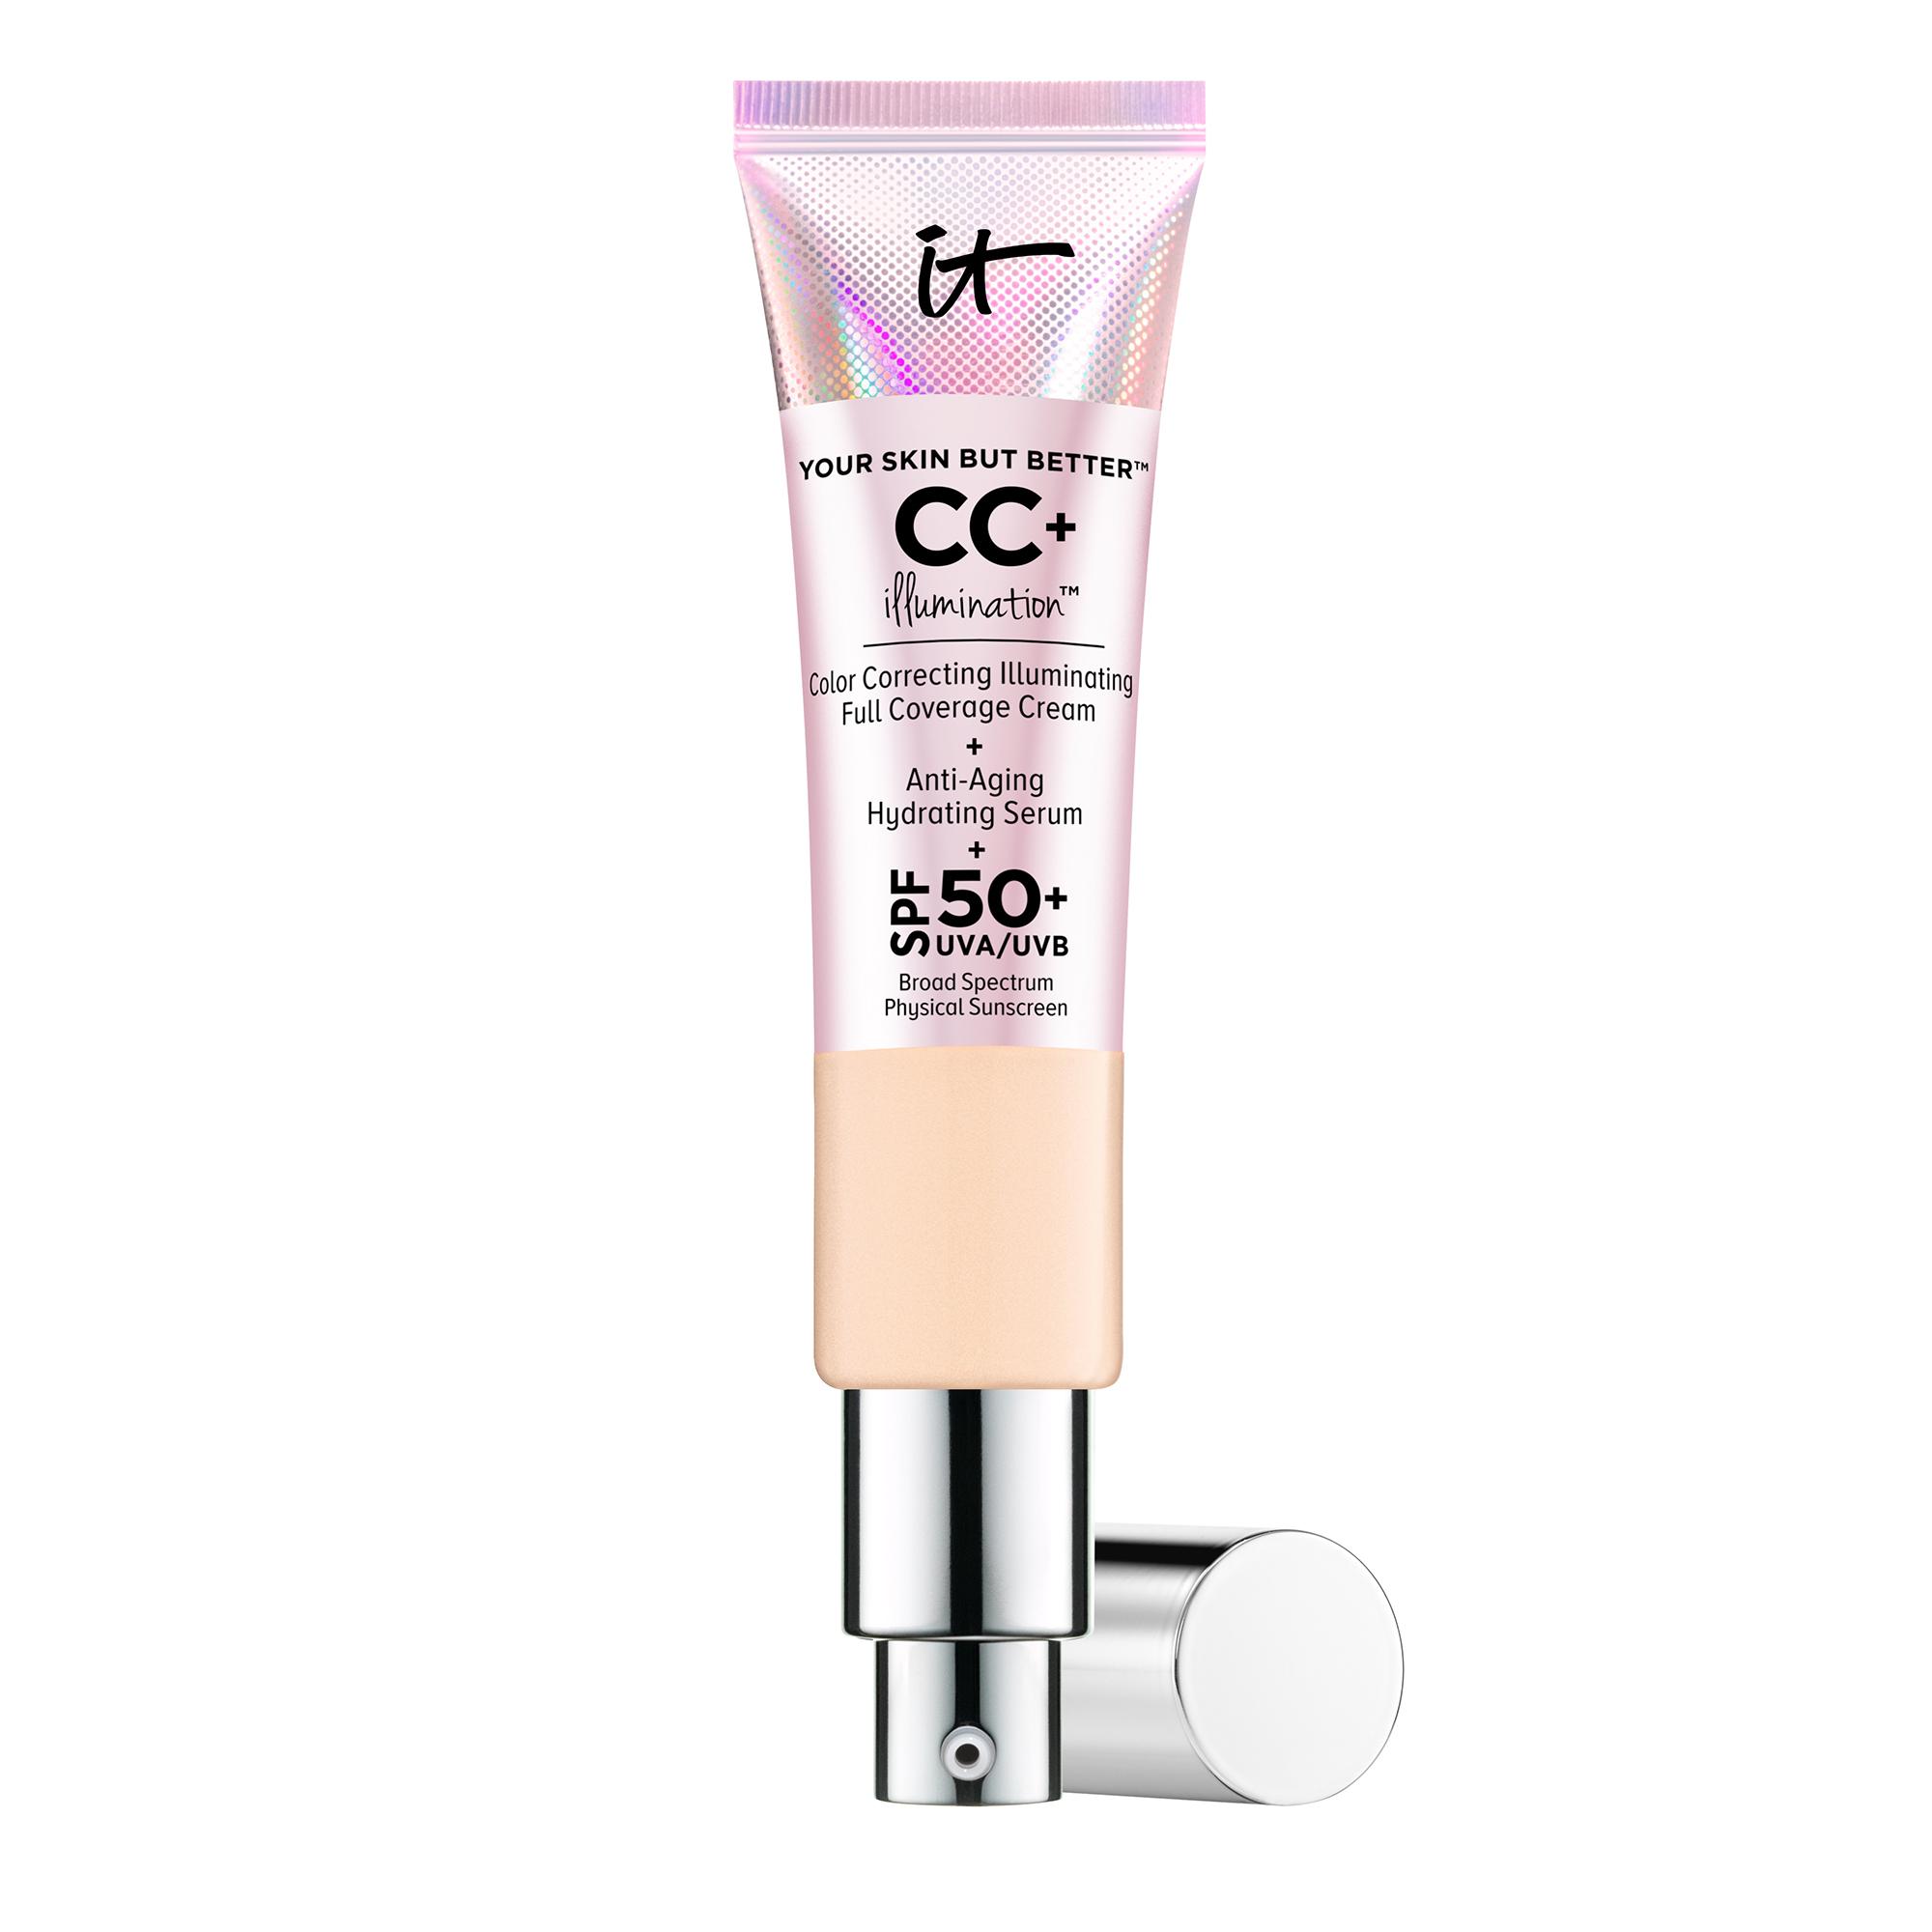 Your Skin But Better™ CC+ Illumination™ SPF 50+ Light Medium